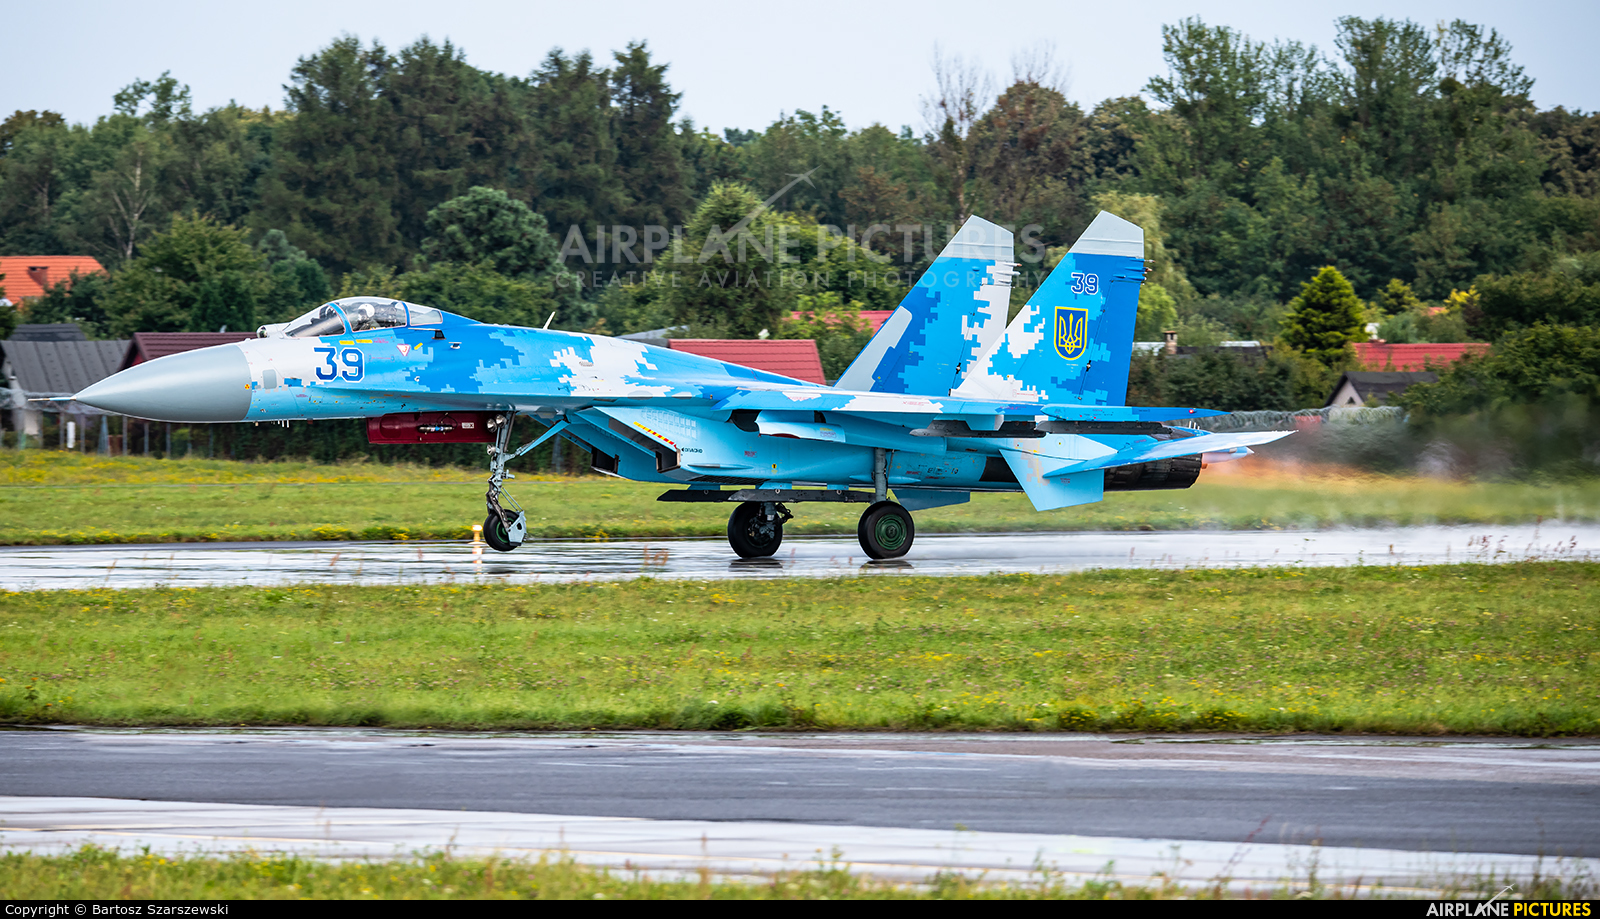 Ukraine - Air Force 039 aircraft at Gdynia- Babie Doły (Oksywie)